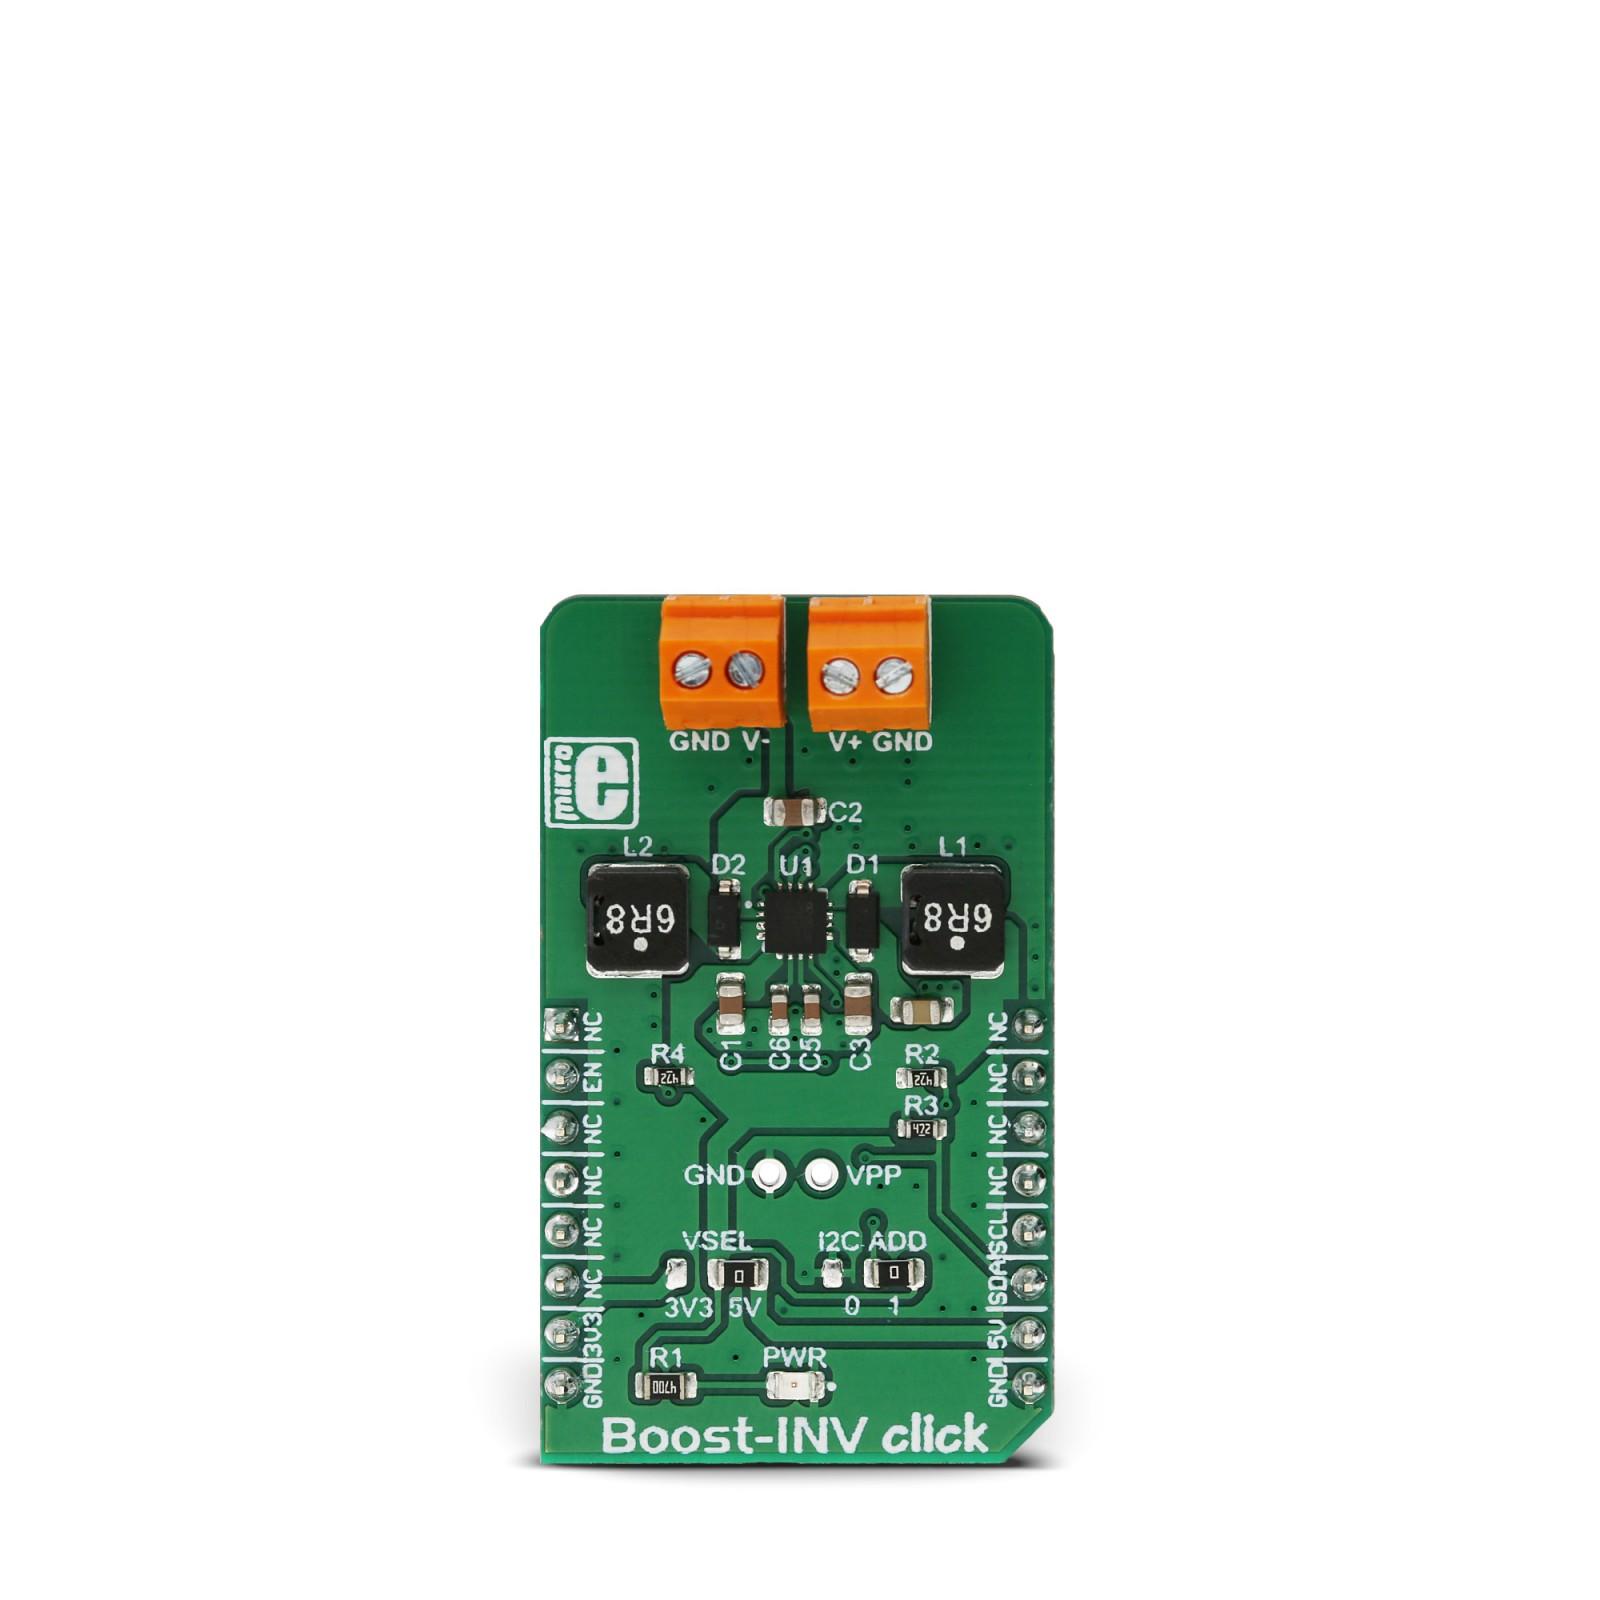 Boost Inv Click Mikroelektronika Circuit Or To Converter A Negative Voltage Positive Mgctlbxnmzp Mgctlbxv5112 Mgctlbxlc Mgctlbxpprestashop